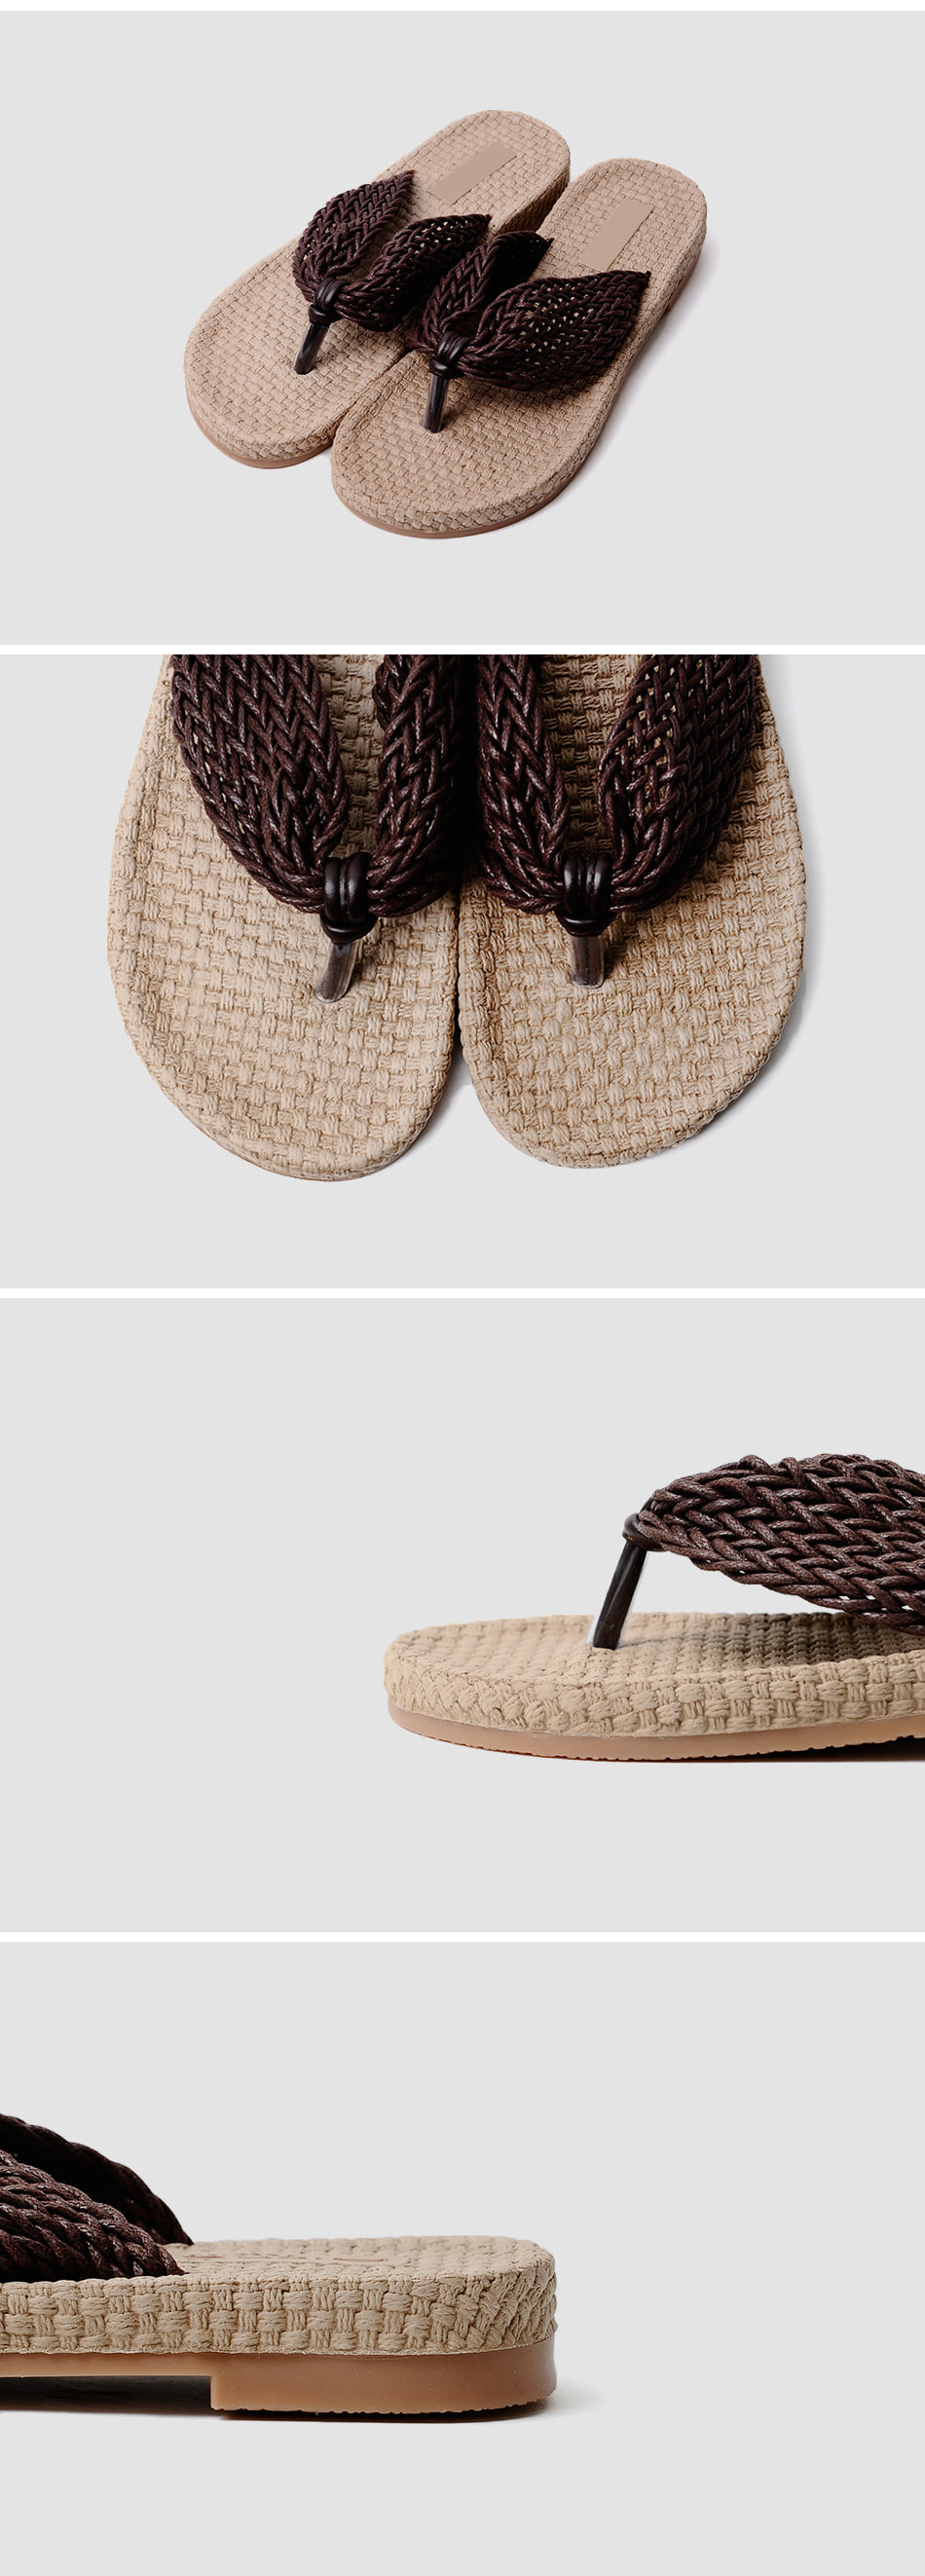 Ebonron Slippers 2cm